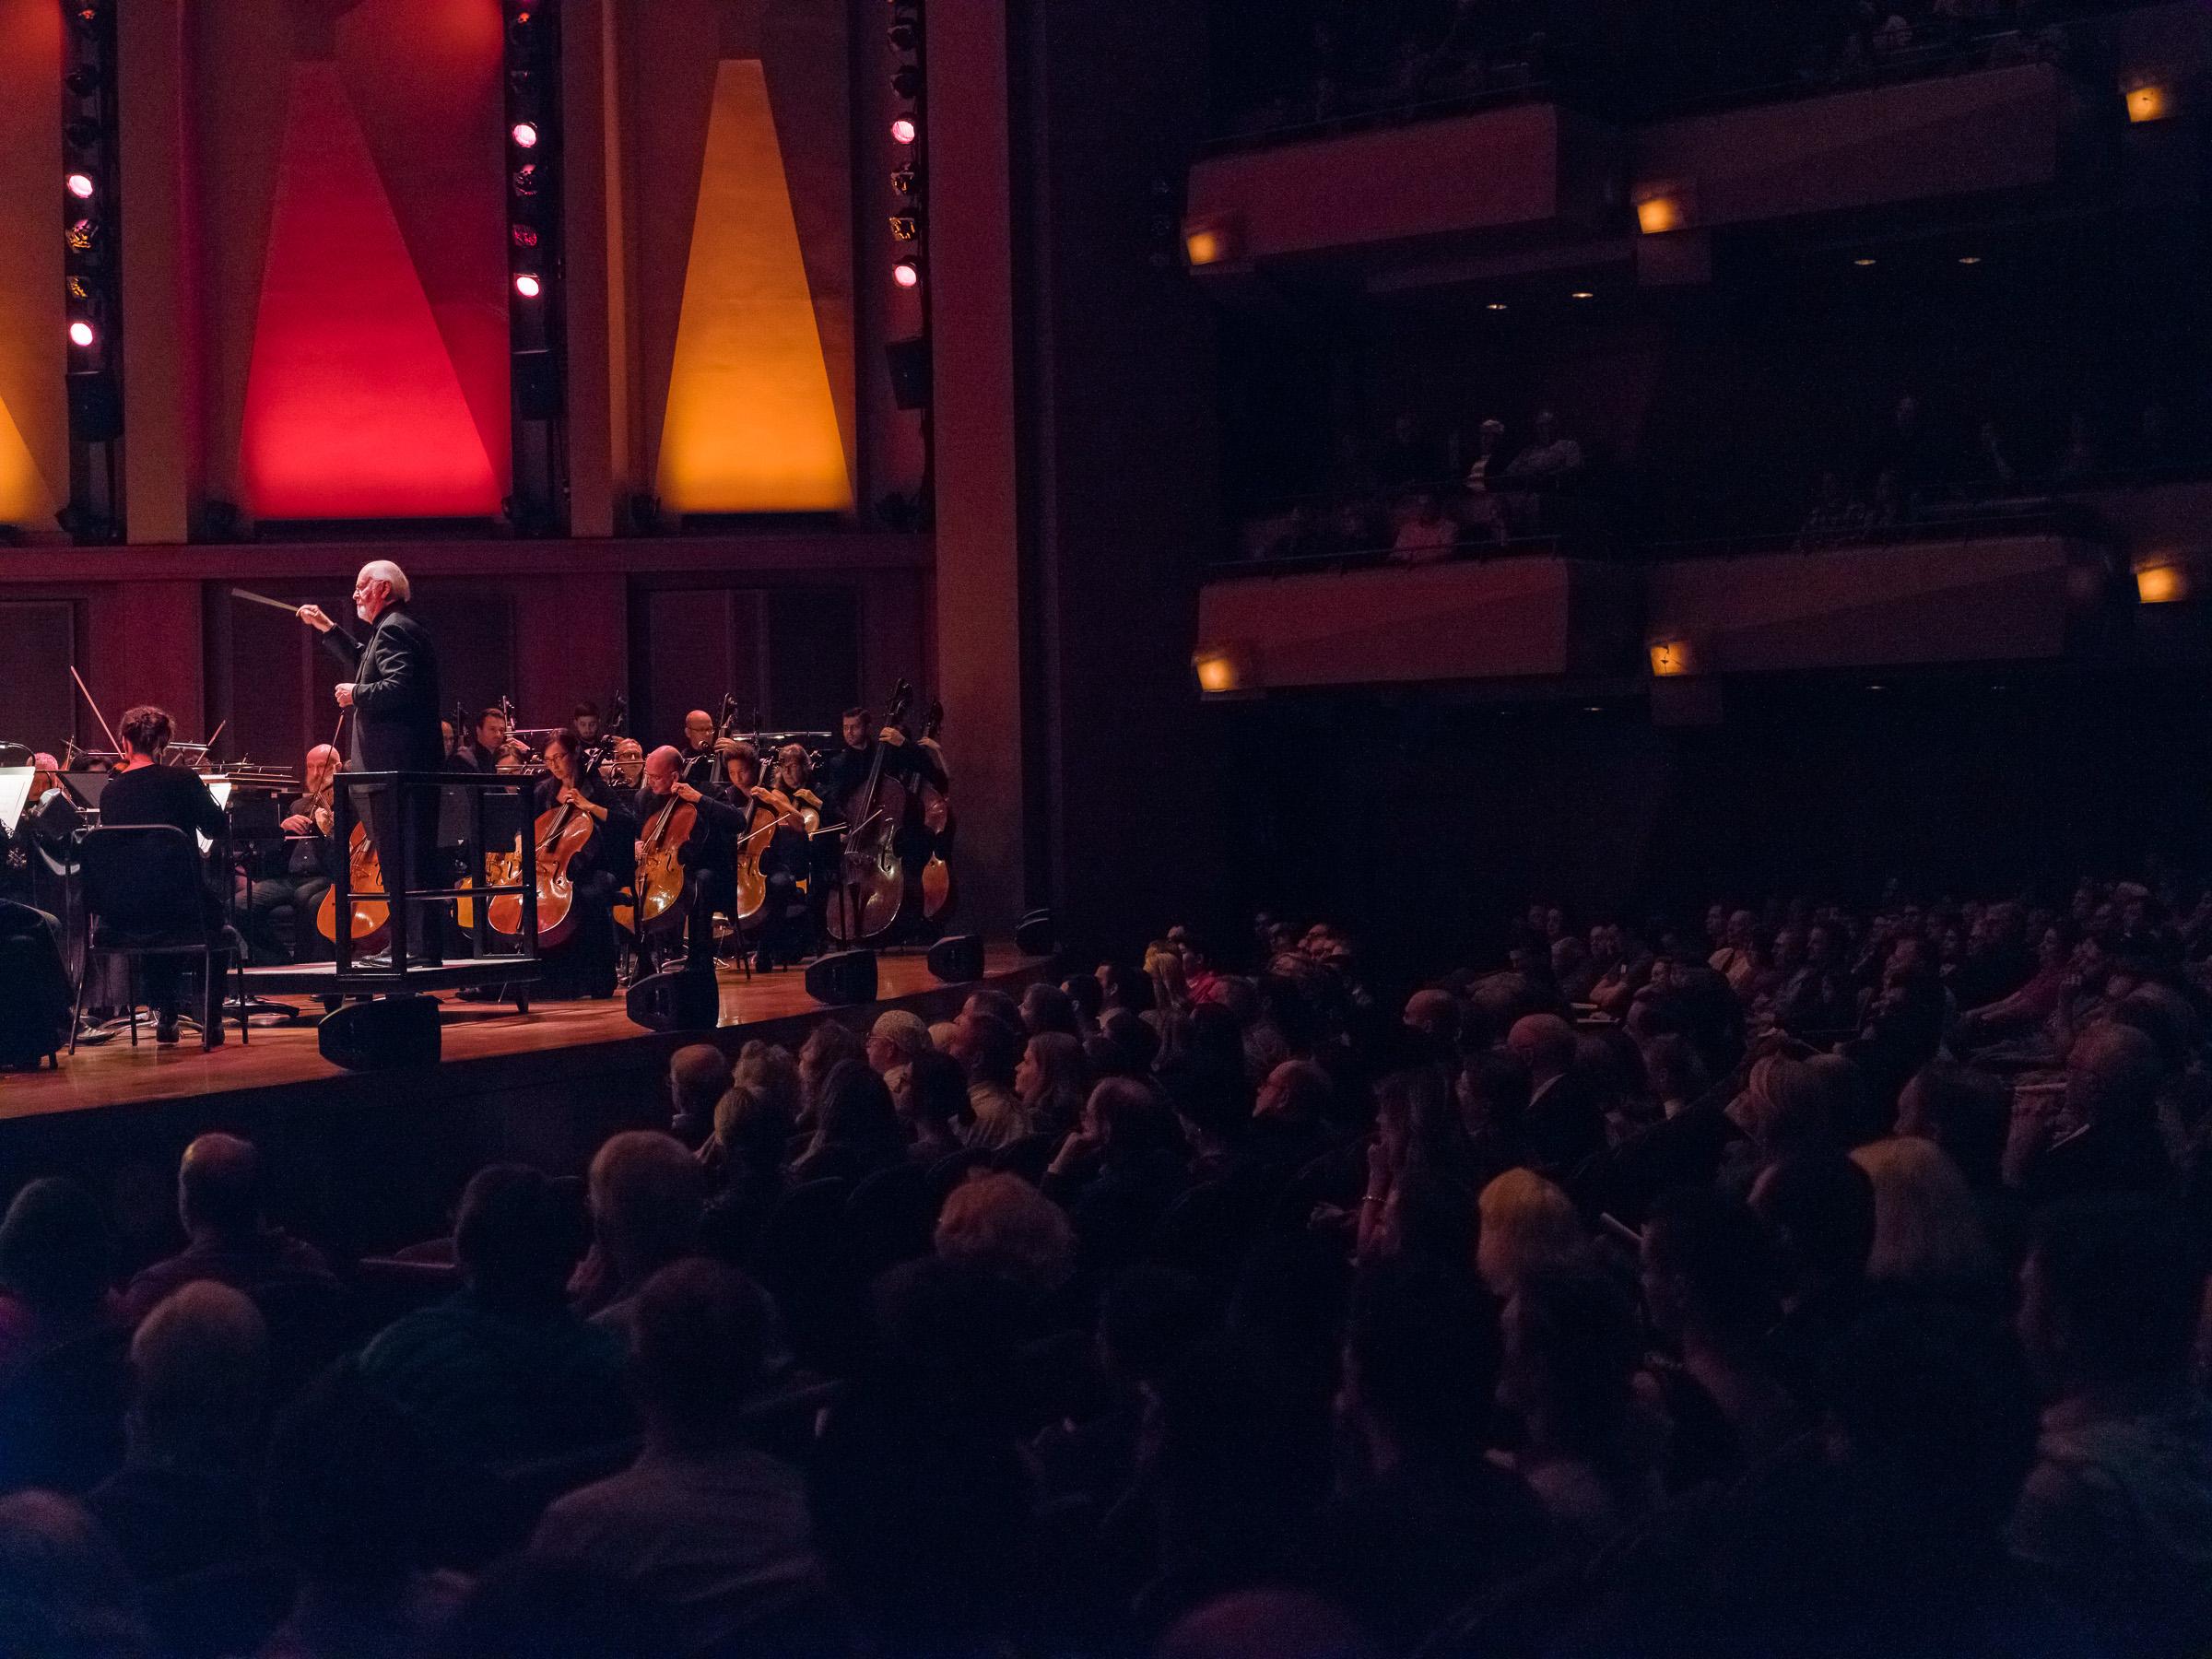 brandon_patoc_john_williams_Steven_Spielberg, Seattle_Symphony_Orchestra_Conert_0004.JPG